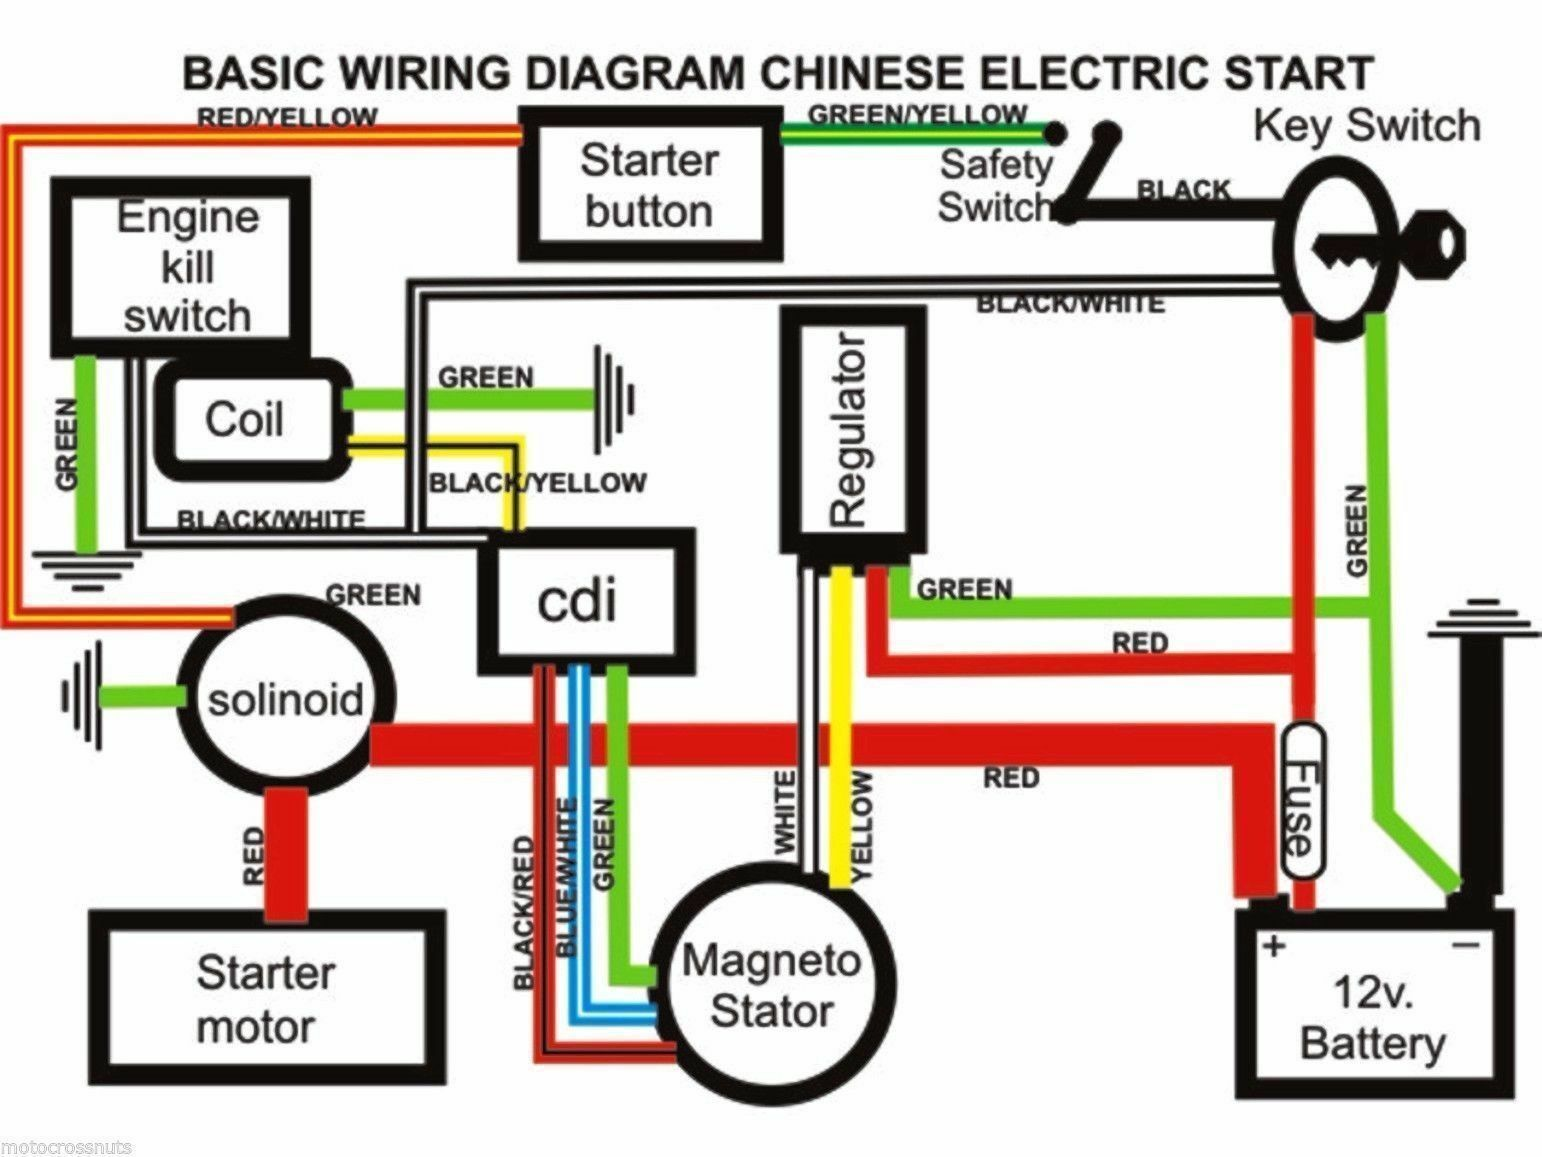 cy50 a wiring diagram kf 9361  bike further moped 50cc scooter wiring diagram on besides  moped 50cc scooter wiring diagram